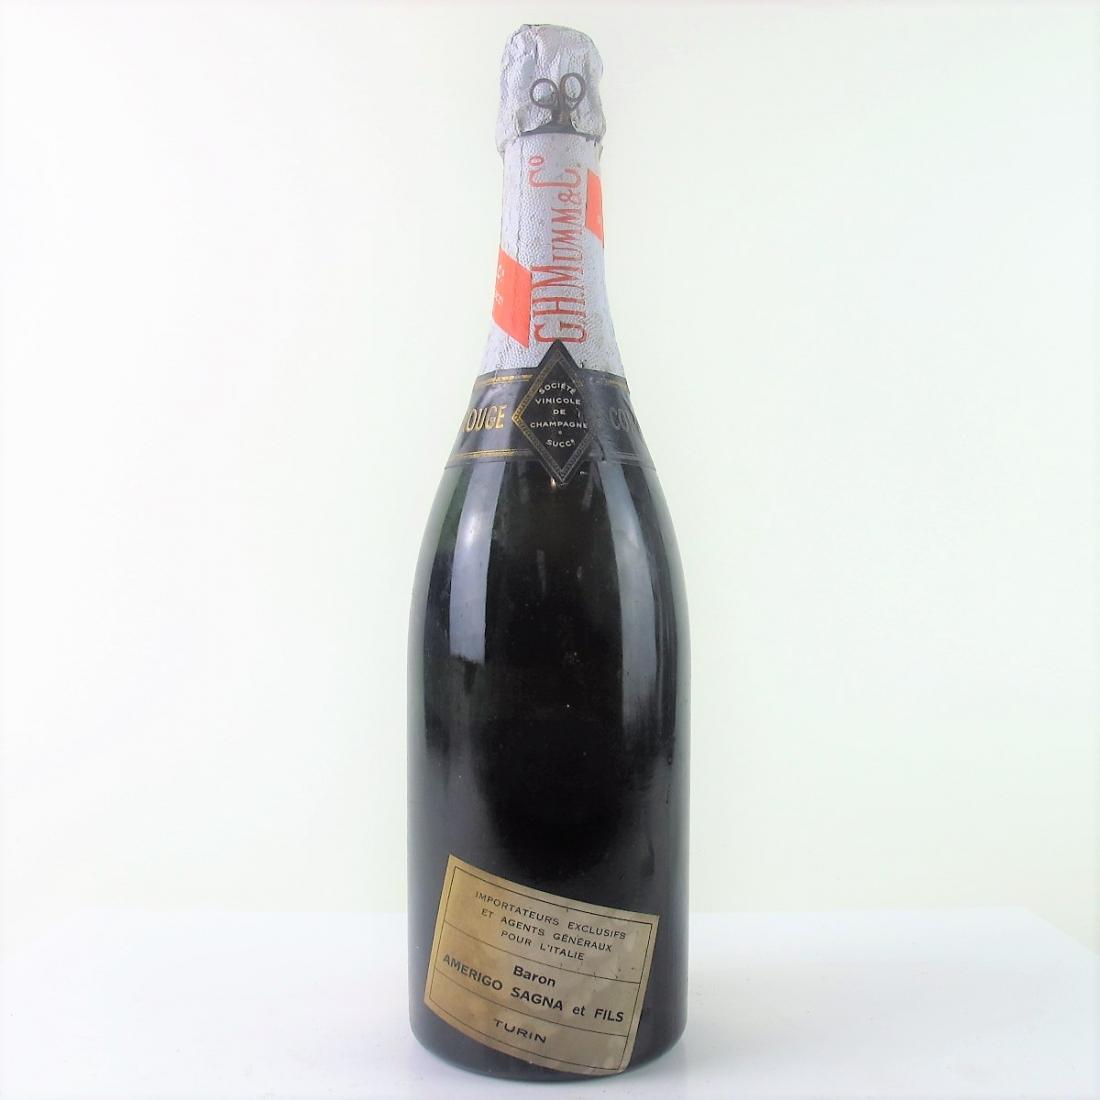 Mumm Cordon Rouge 1959 Vintage Champagne